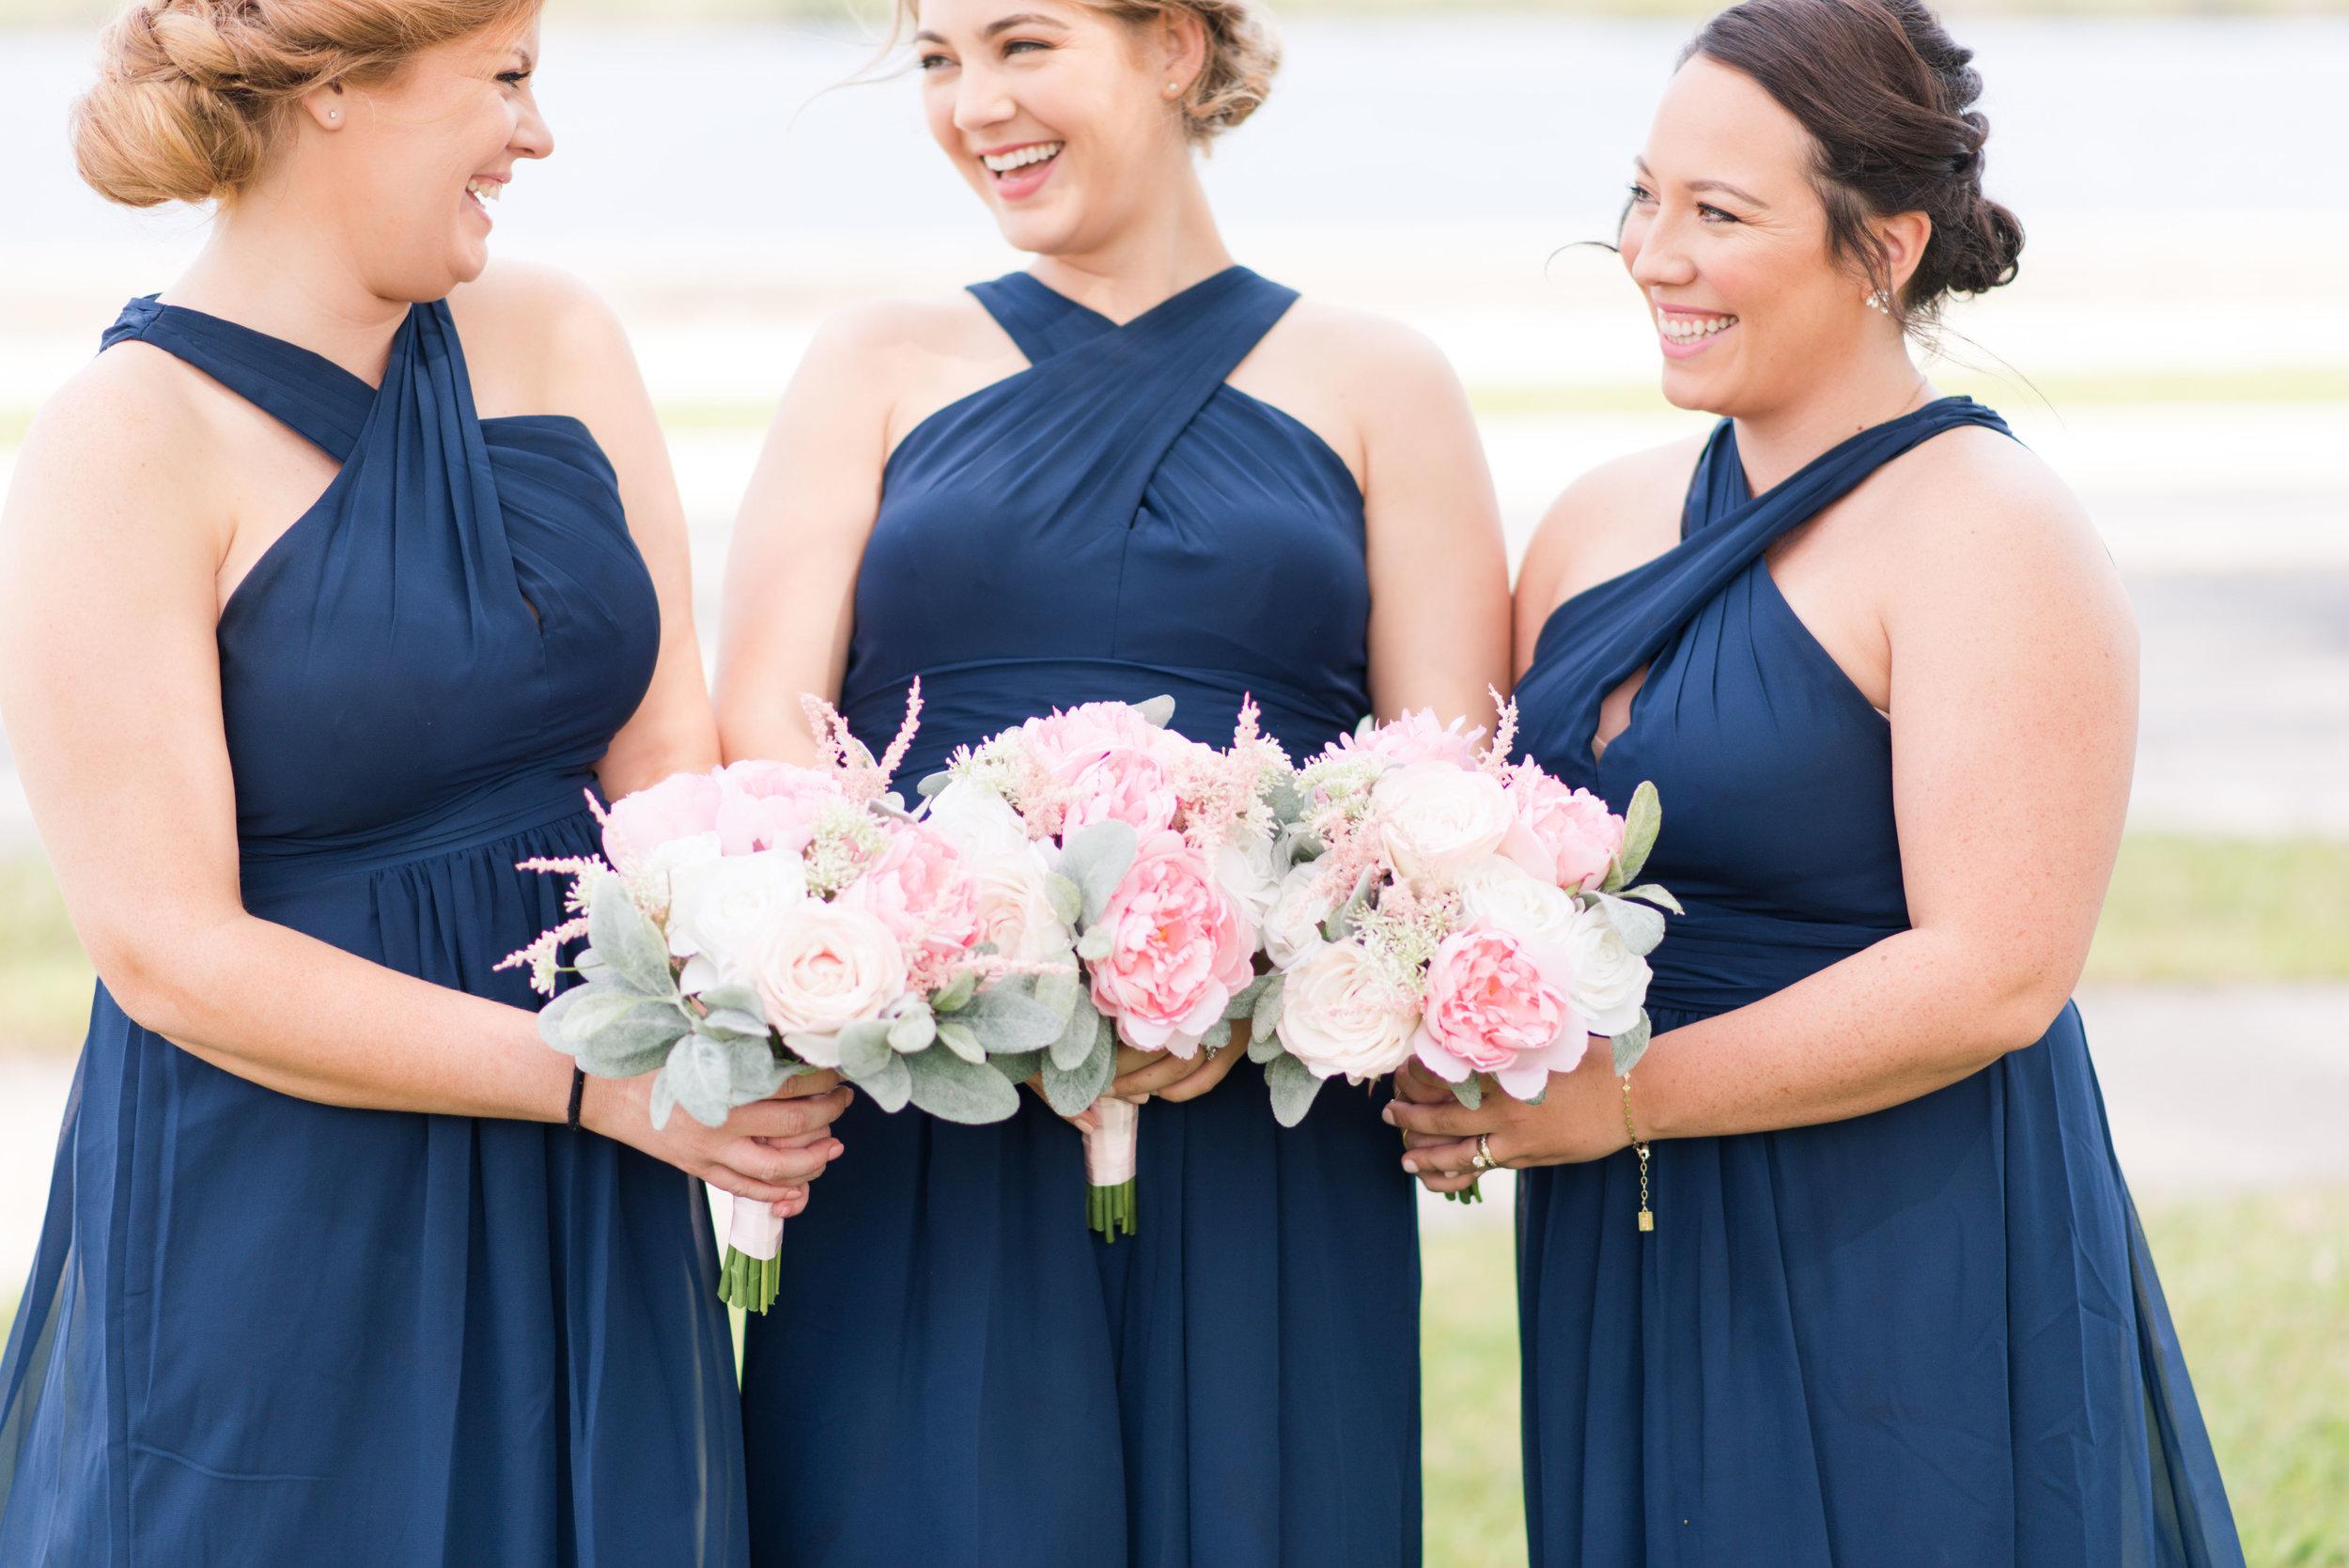 2019_04_06_Hart_Wedding_CMageePhotography_3.jpg